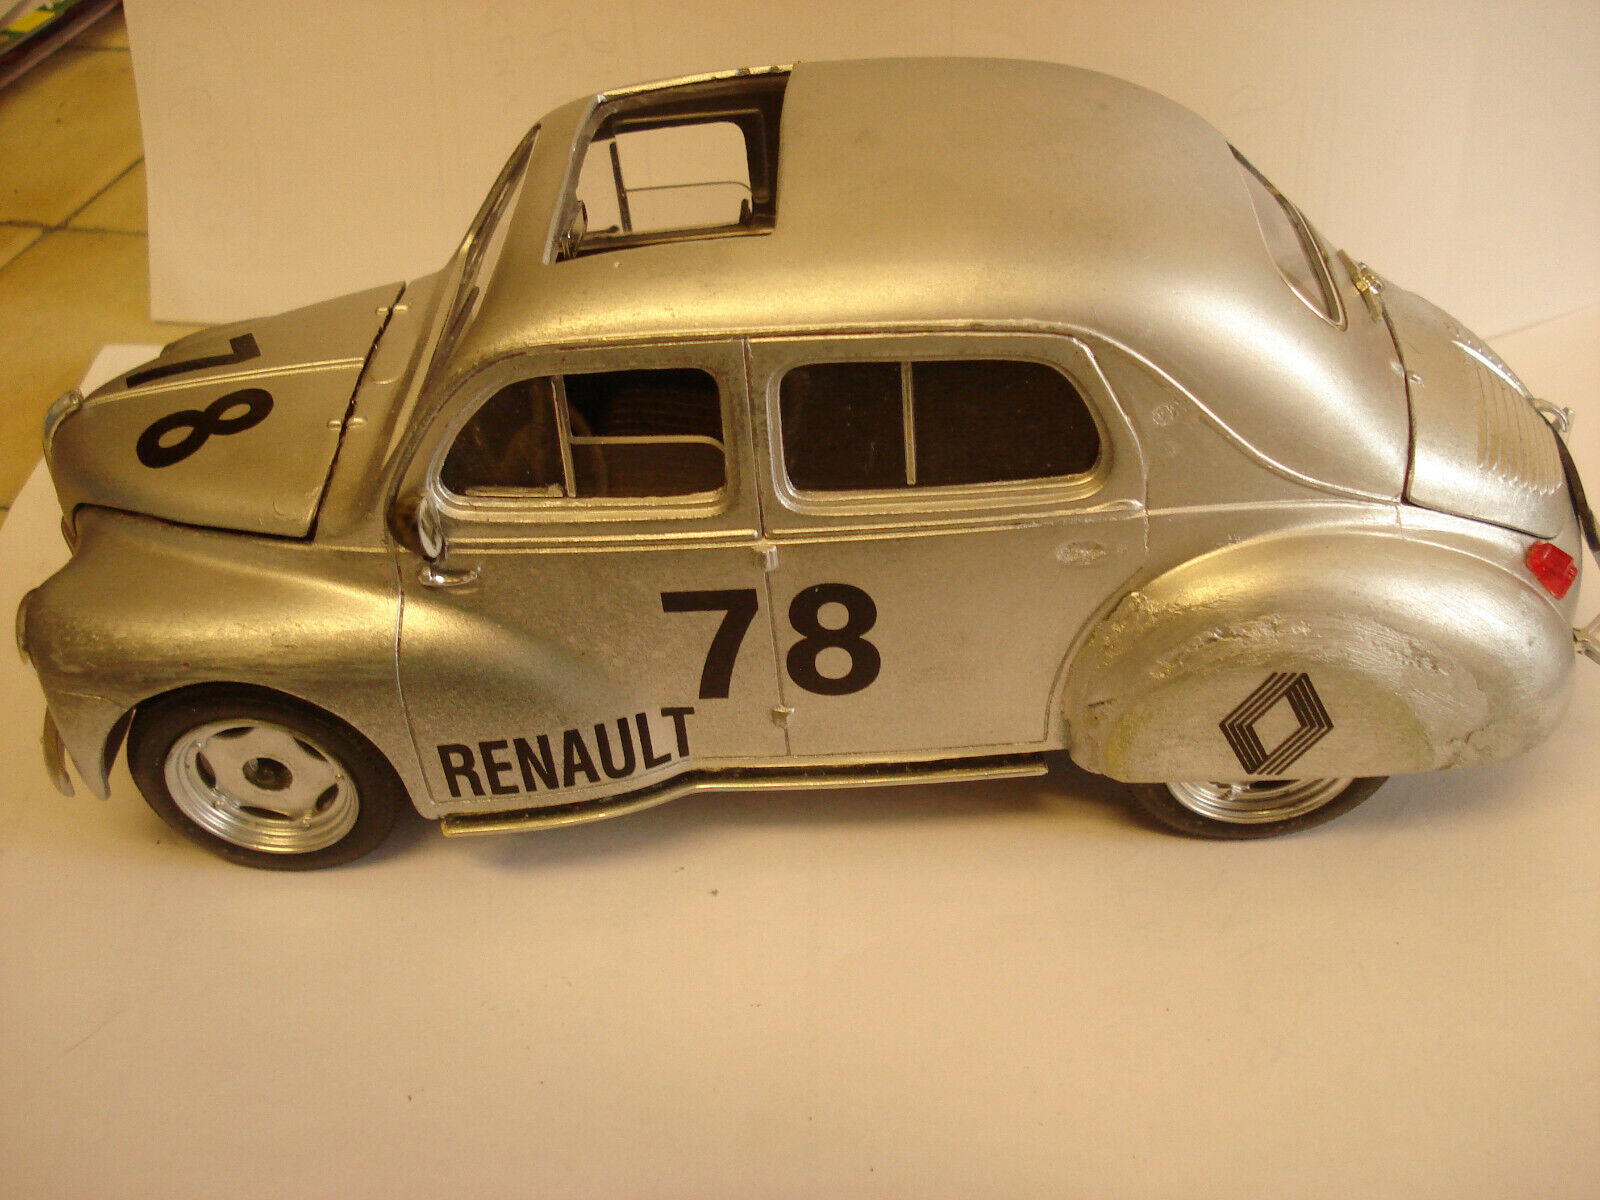 Solido   RARE   Renault 4 CV   Rallye   a toit  ouvrant    - -  1 17 - -   TBE  magasin d'usine